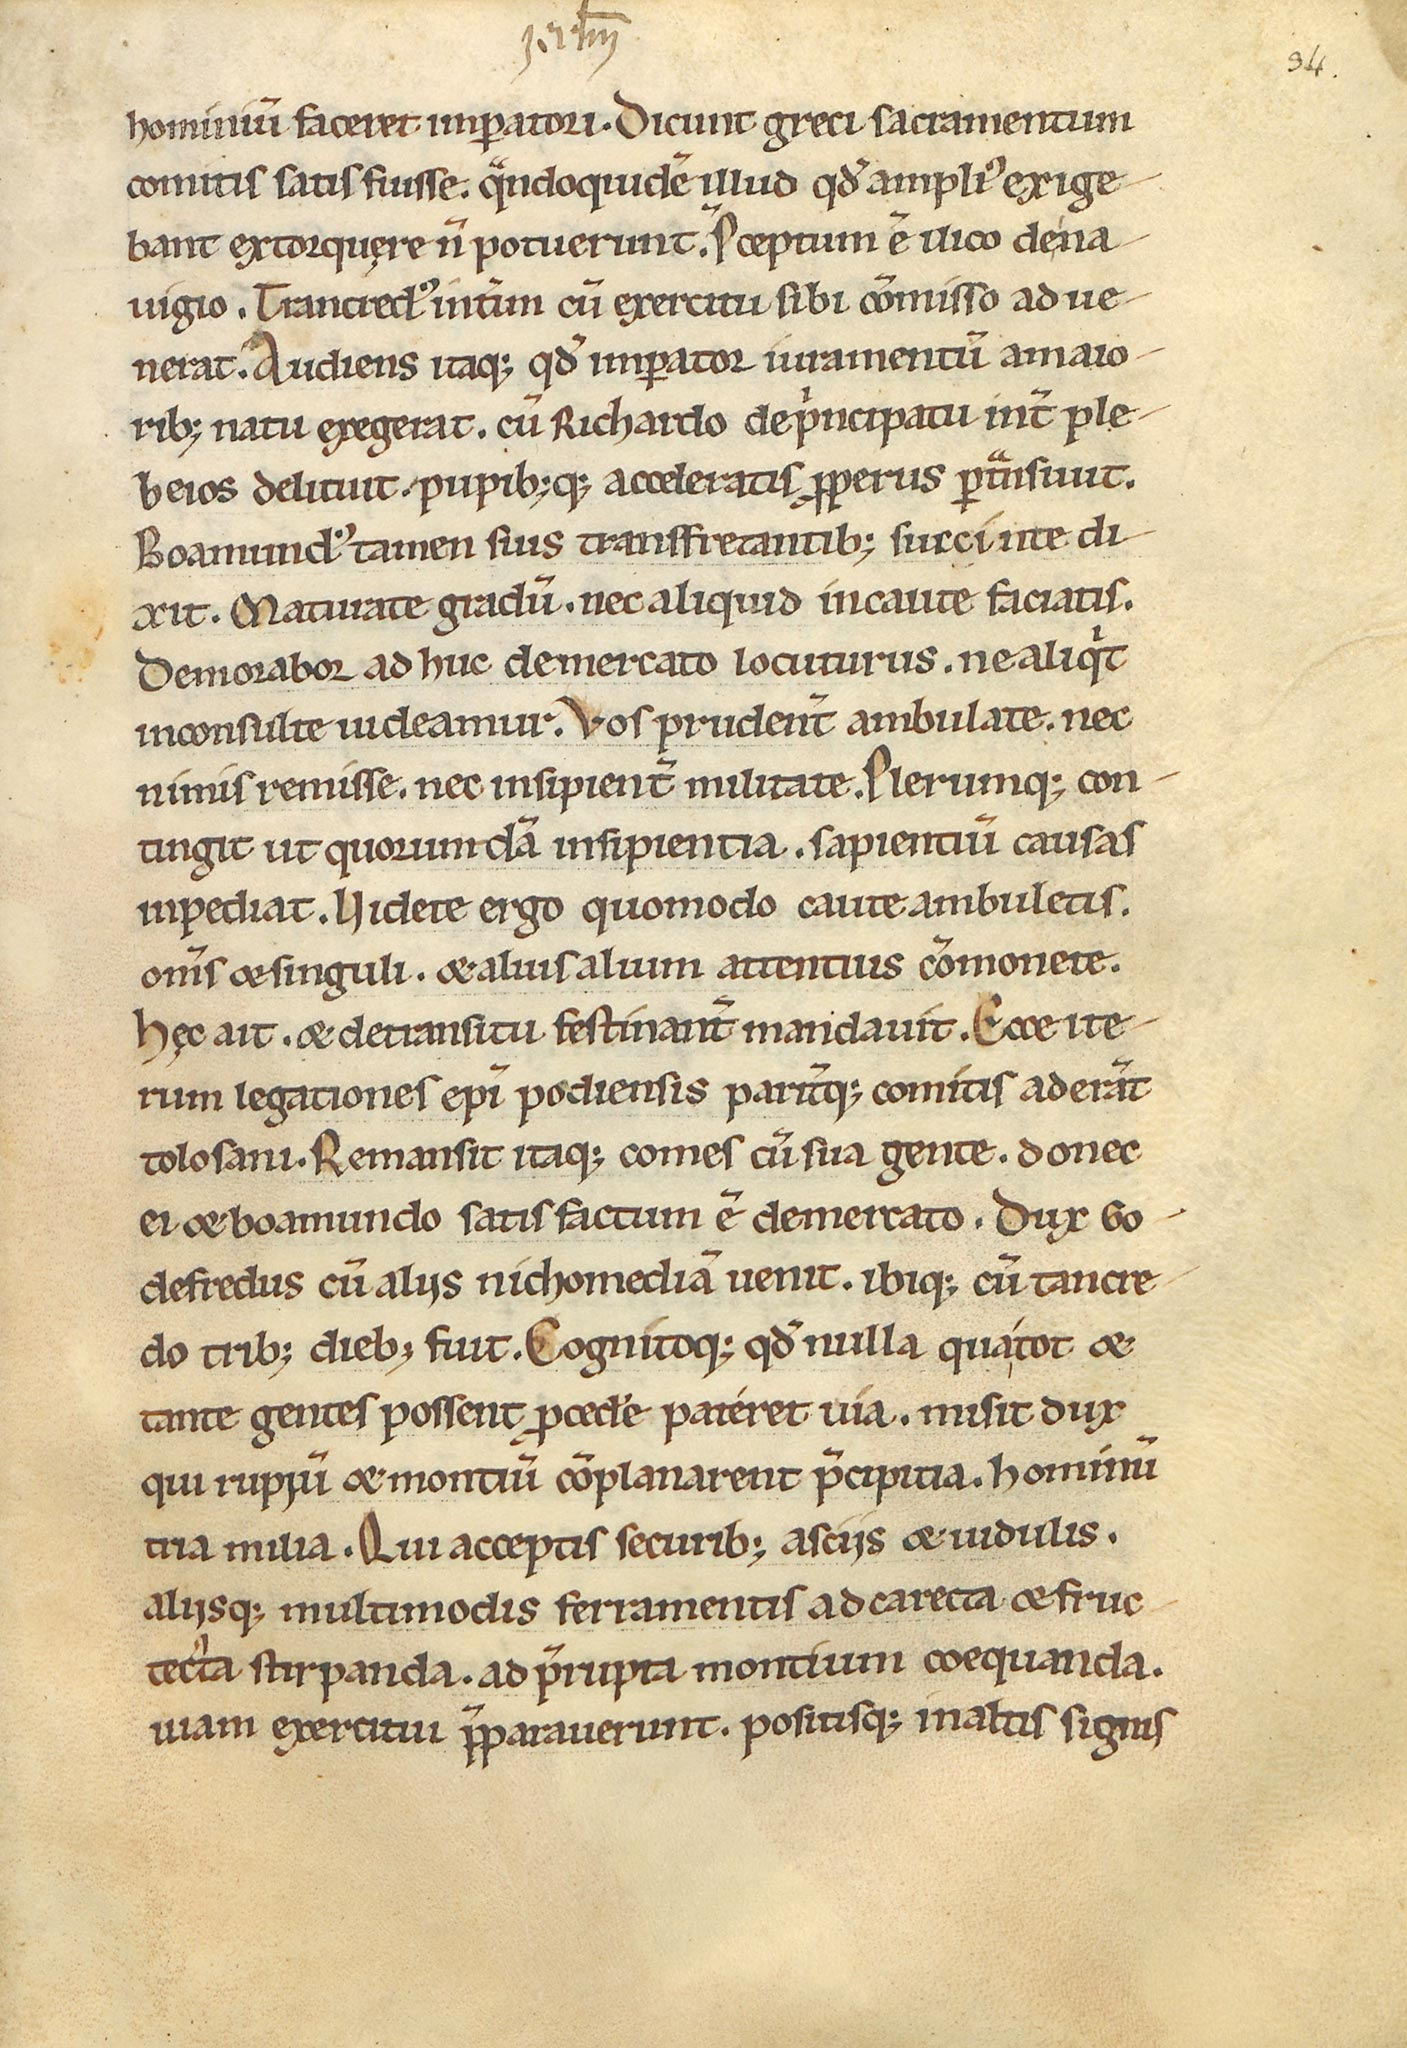 Manuscrit-Historia-Hierosolimitana-34r°